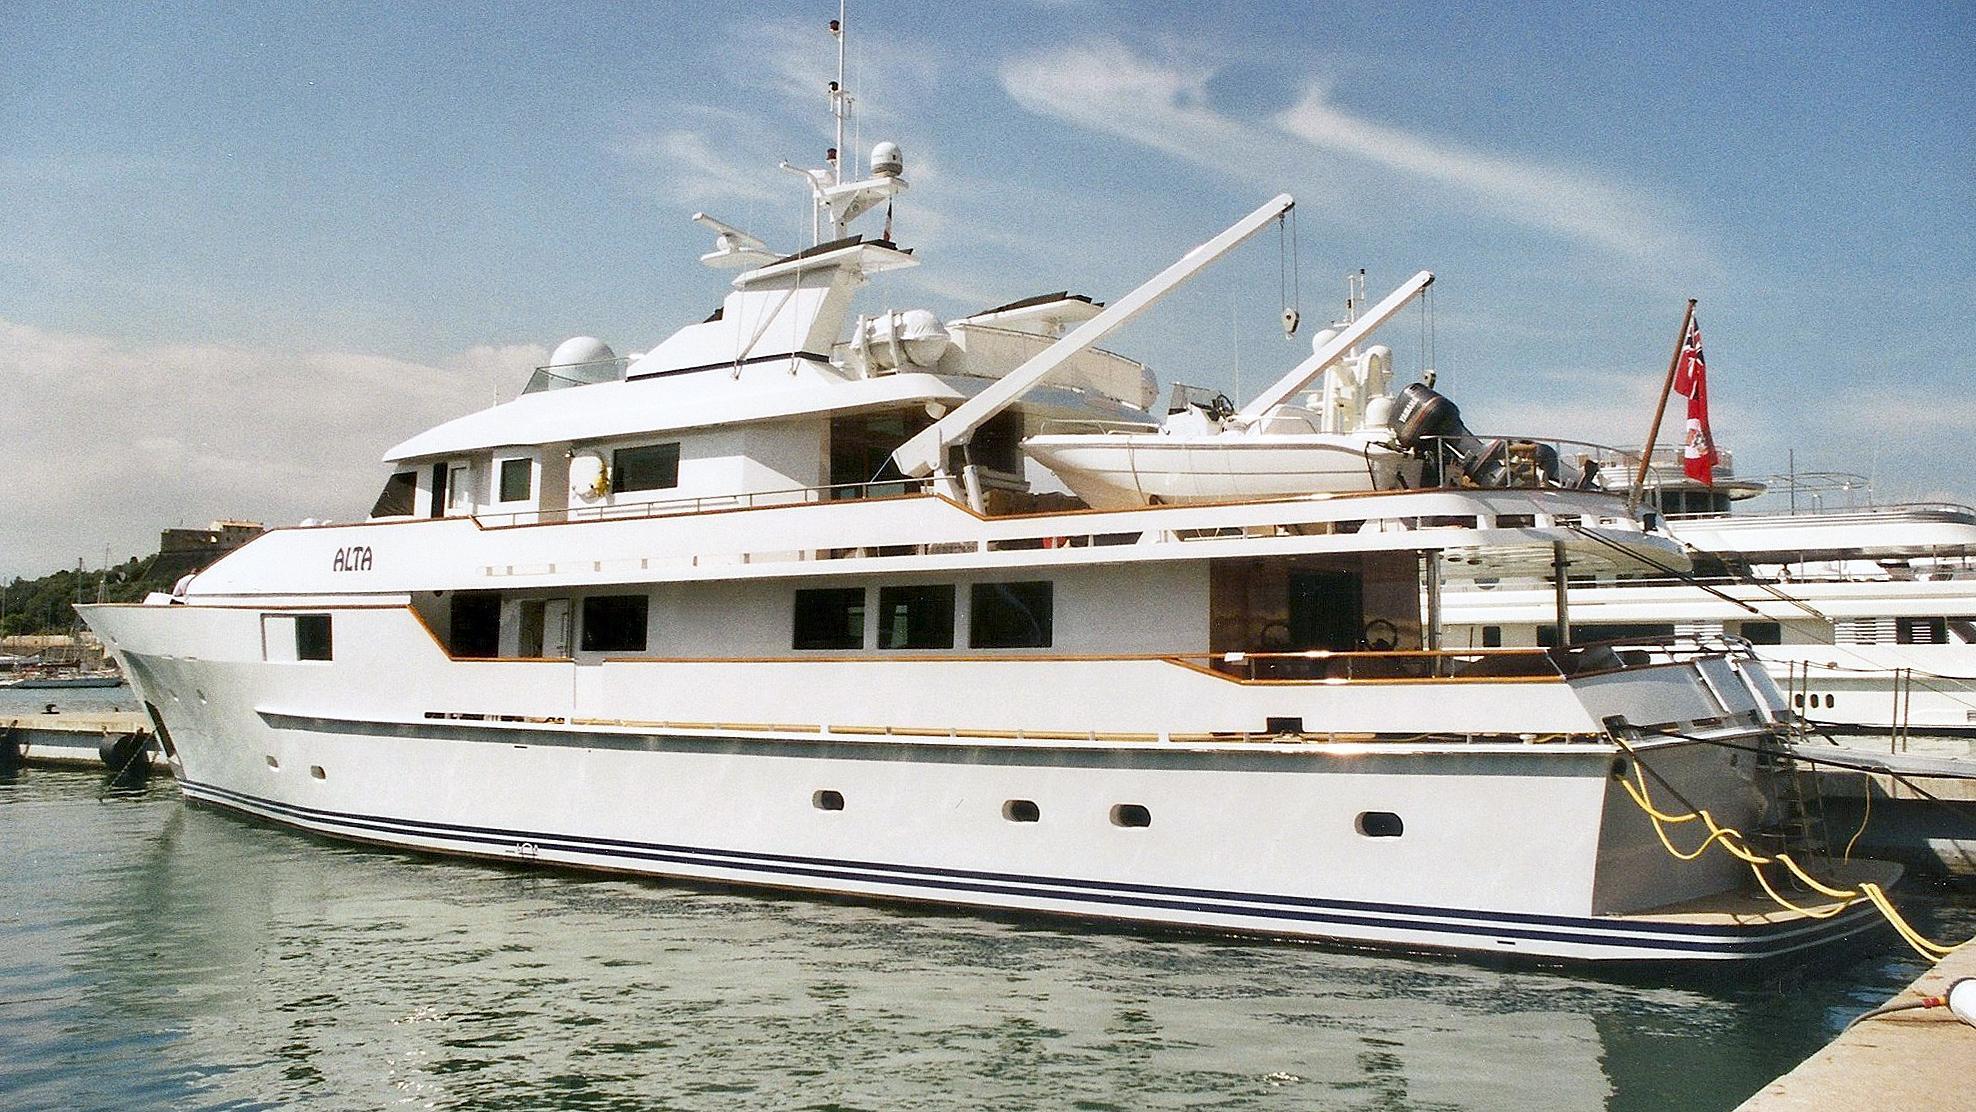 stella-maris-motor-yacht-picchiotti-1987-38m-stern-profile